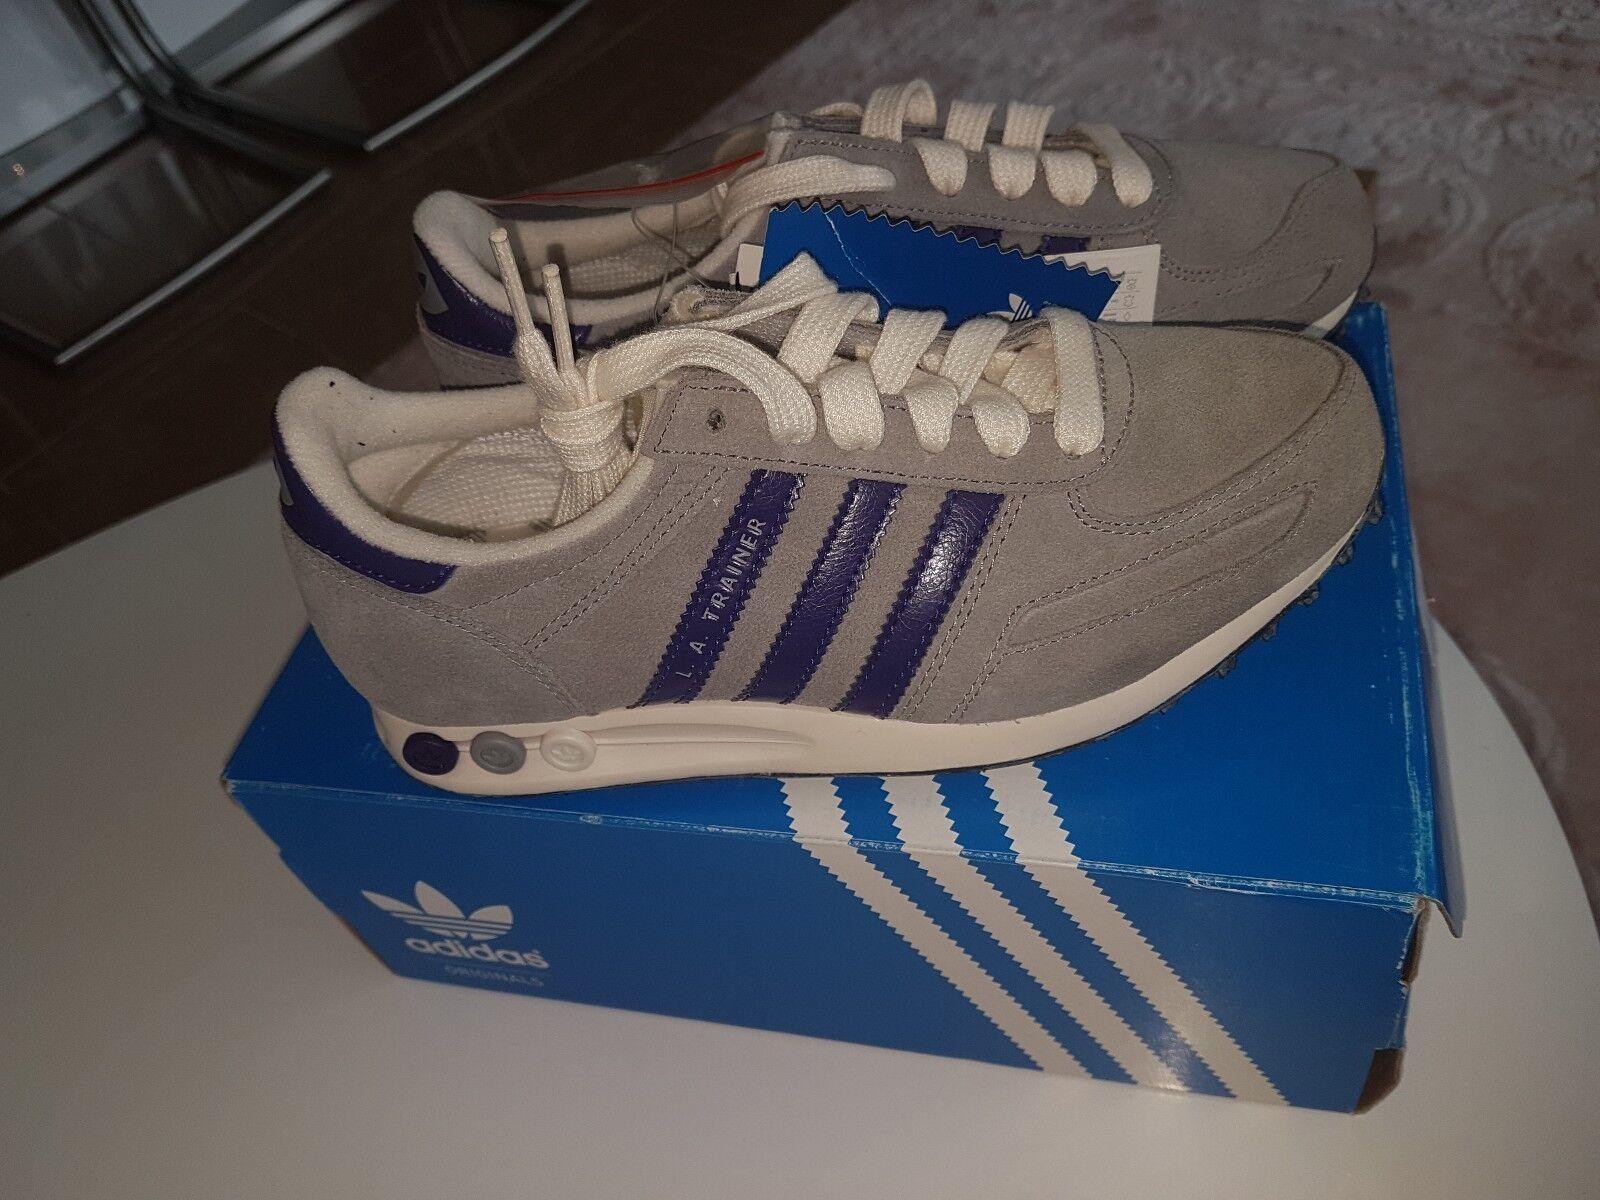 Adidas la Trainer W 36  Vintage zx flux grau/lila Damenschuhe Gr 36   Damenschuhe grau/lila 3b0fc8